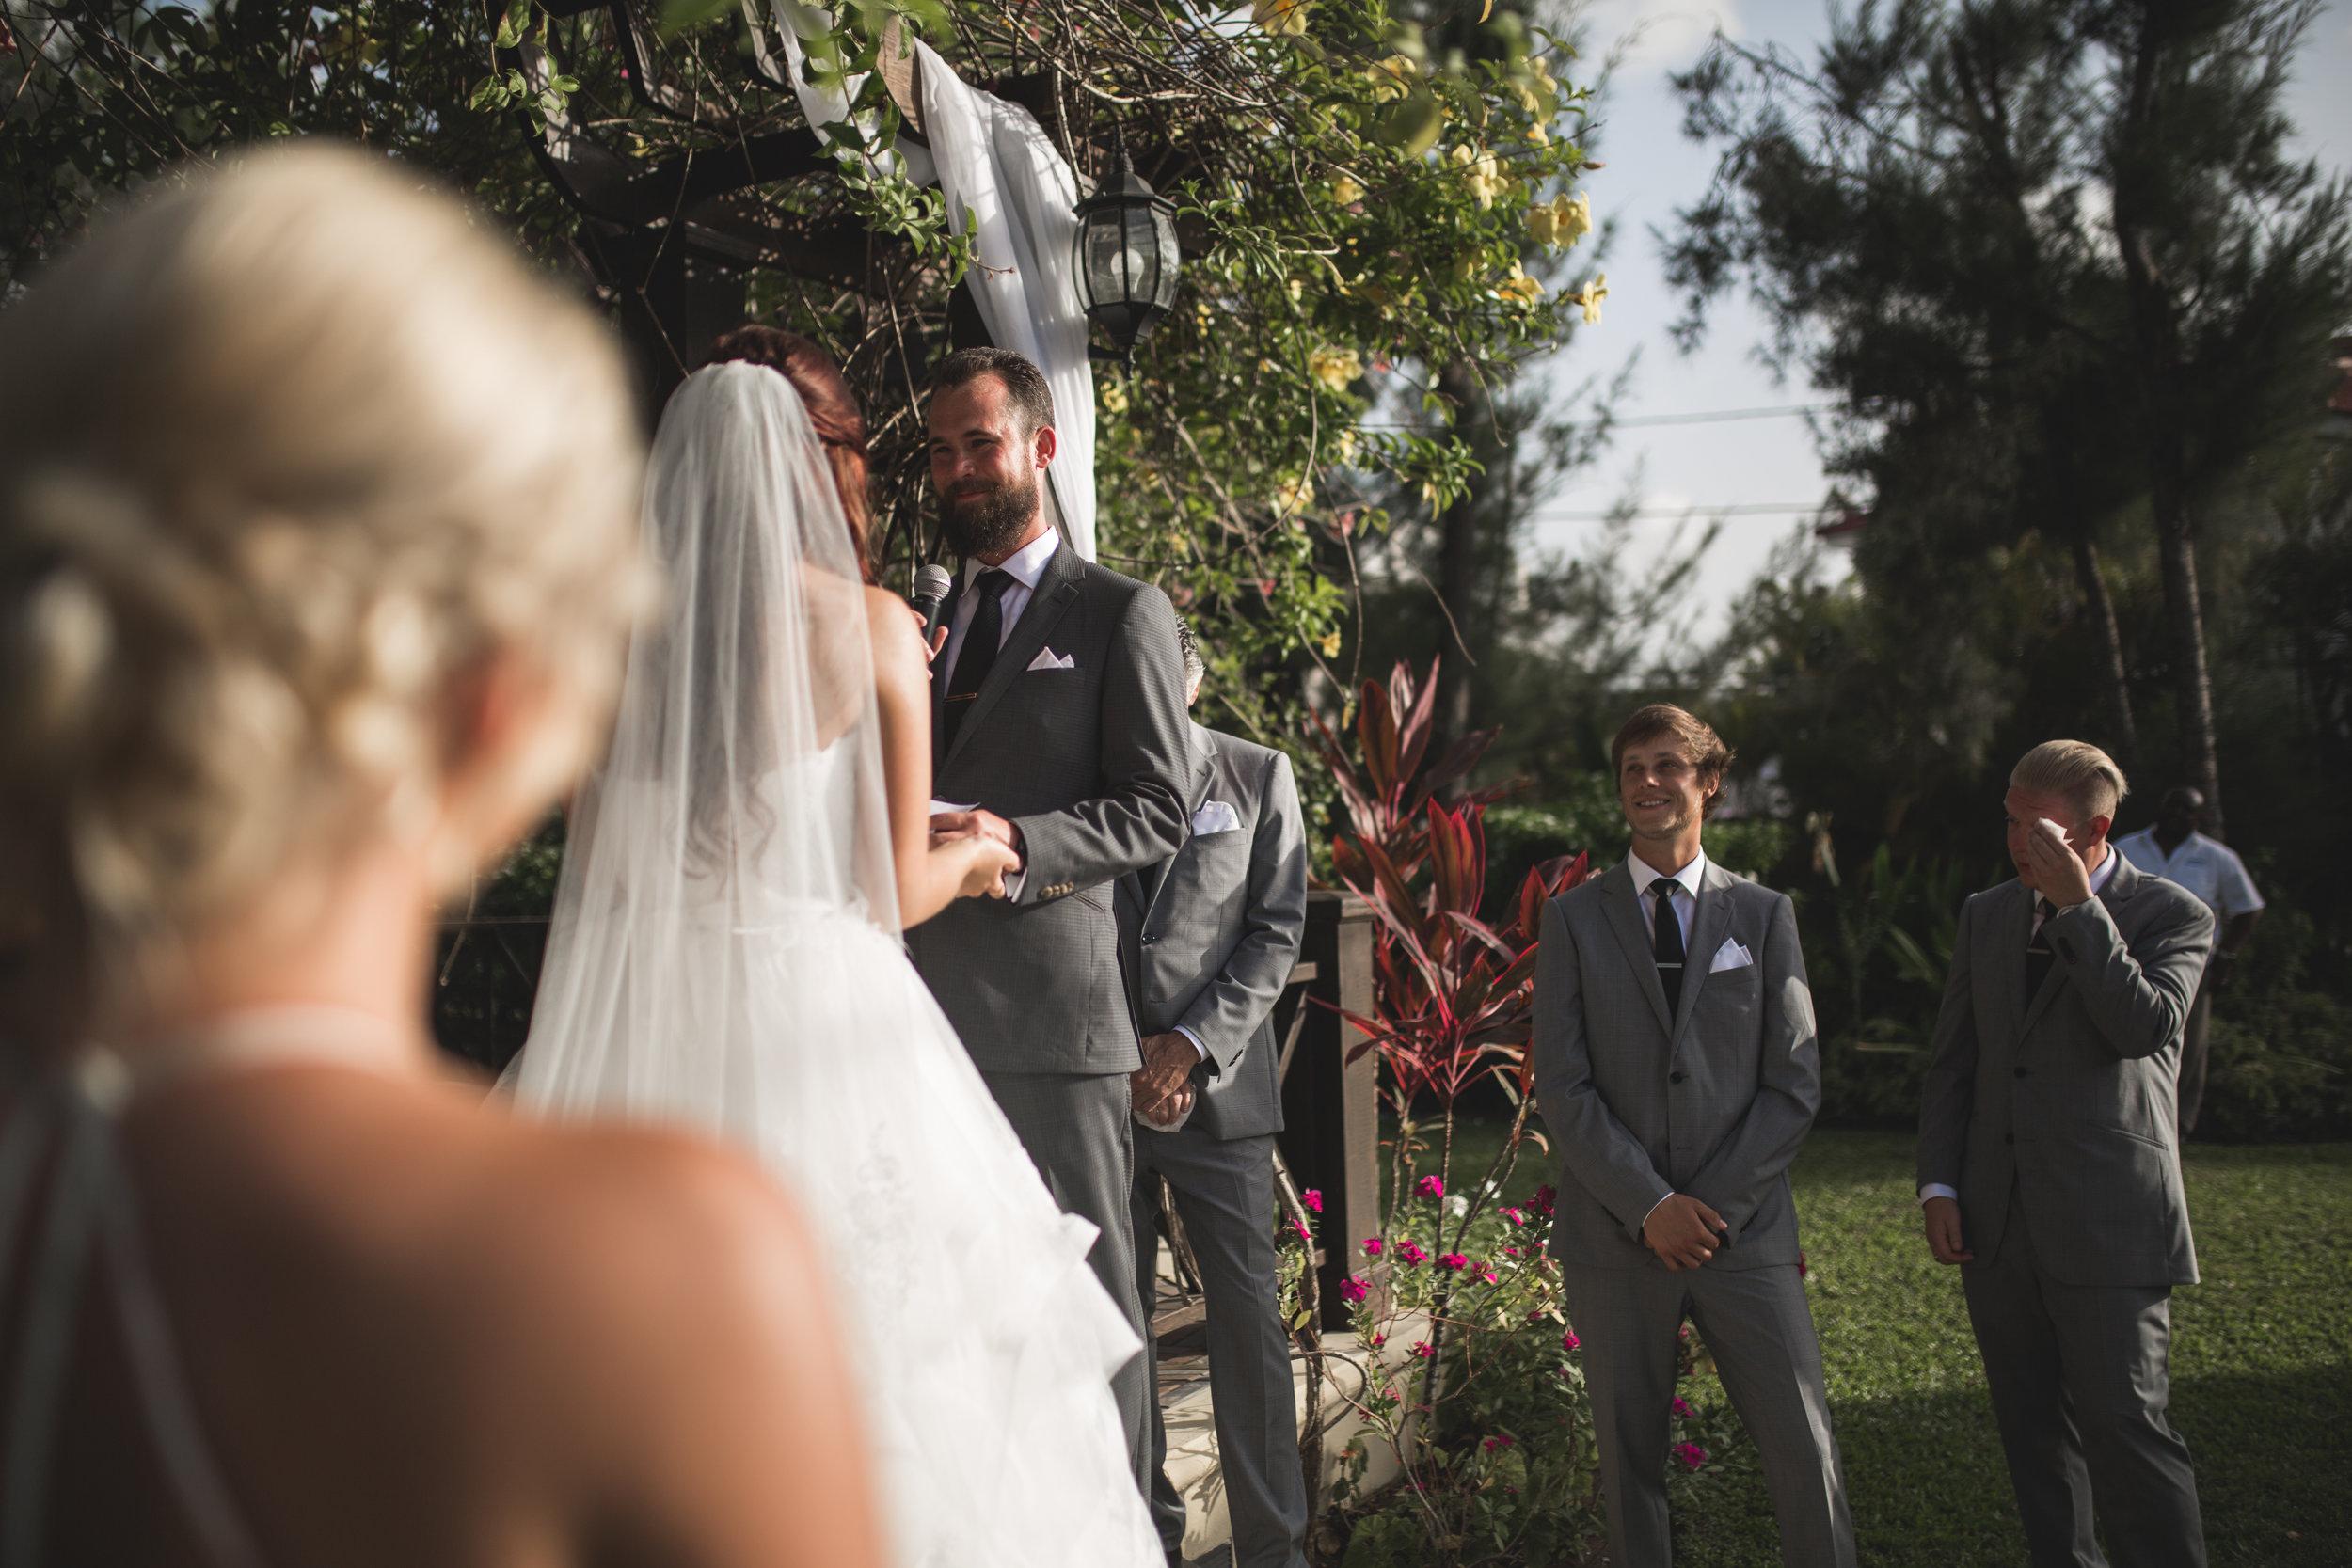 Victoria BC Wedding Photographer - Adam Ziorio Photography.jpg